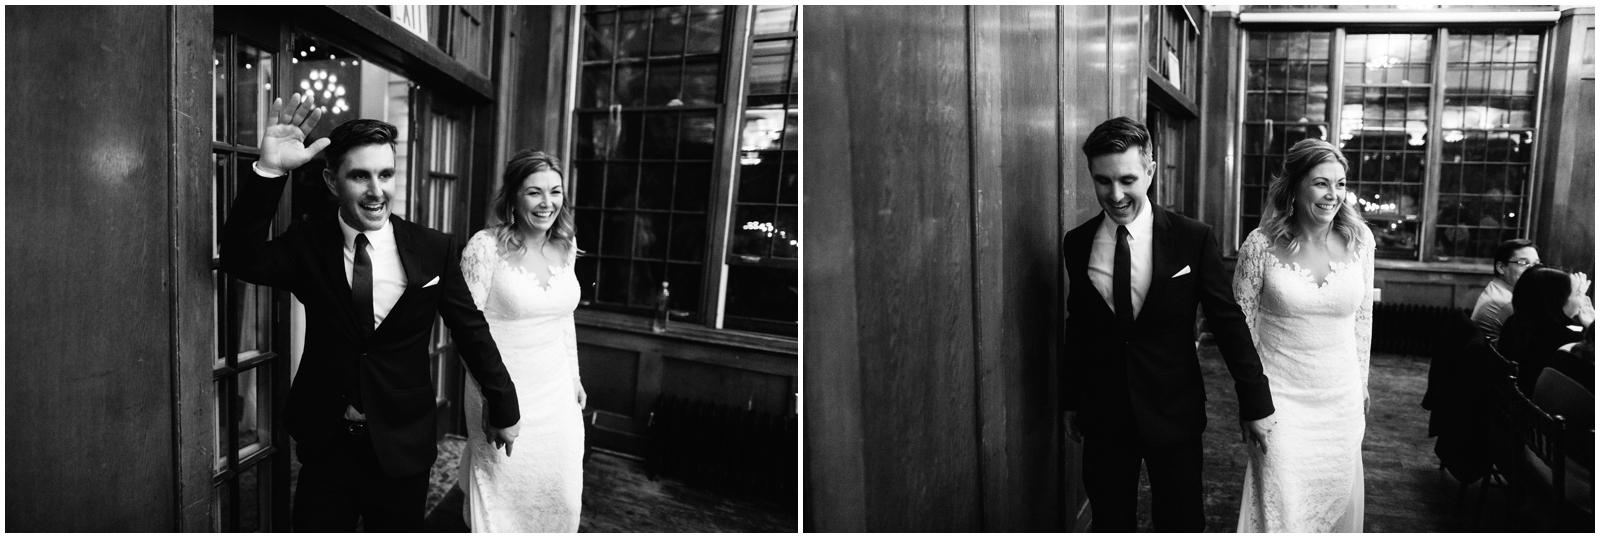 Minnesota Wedding Planner, Mpls Wedding Planner, Machine Shop MPLS, Mpls Wedding Venue . Bride and groom walking into their wedding reception